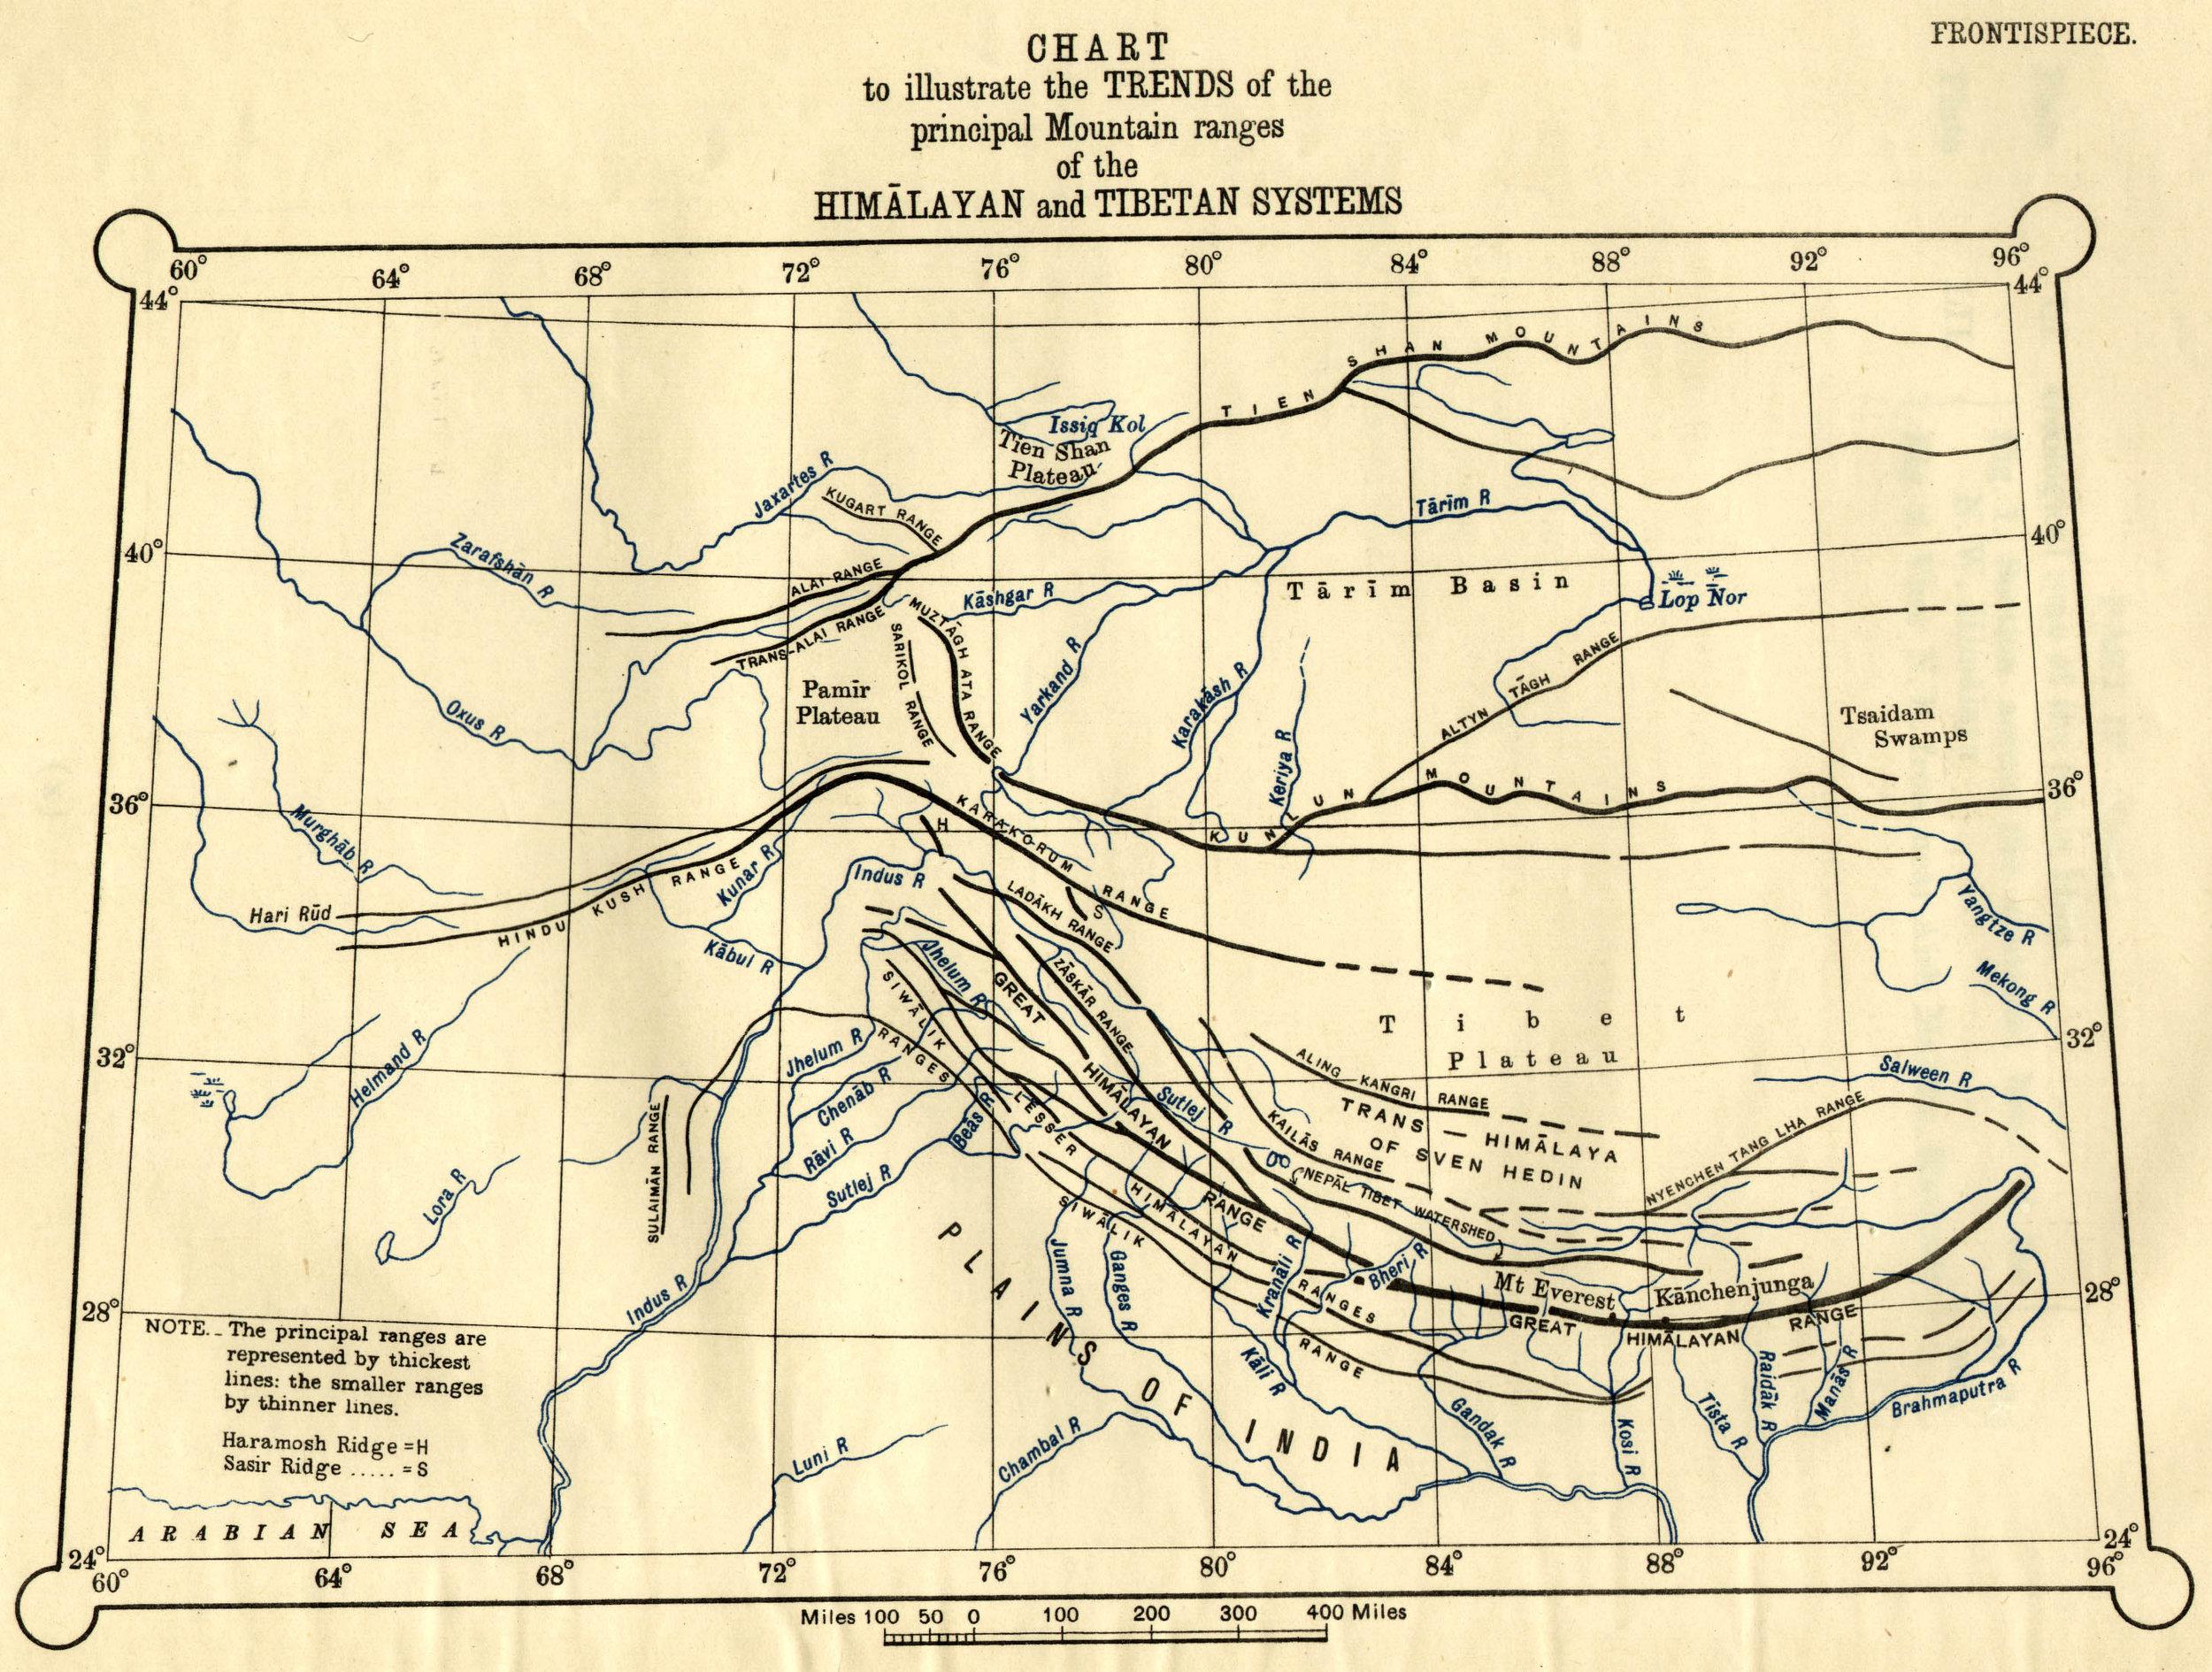 Himalayas and its sub-Ranges -